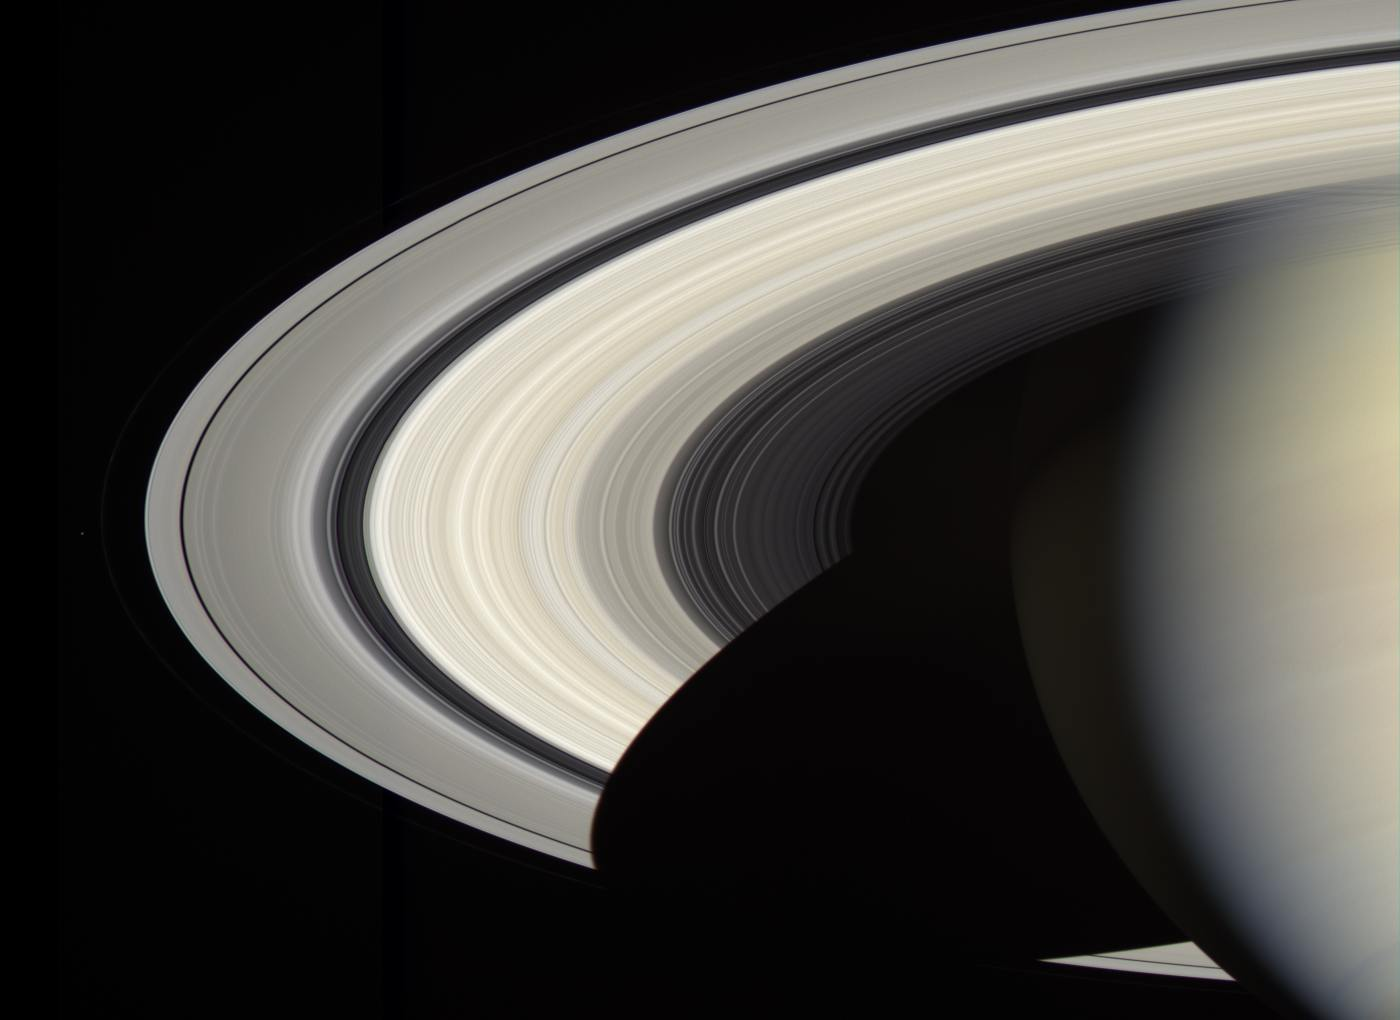 Планета Сатурн, вид из космоса